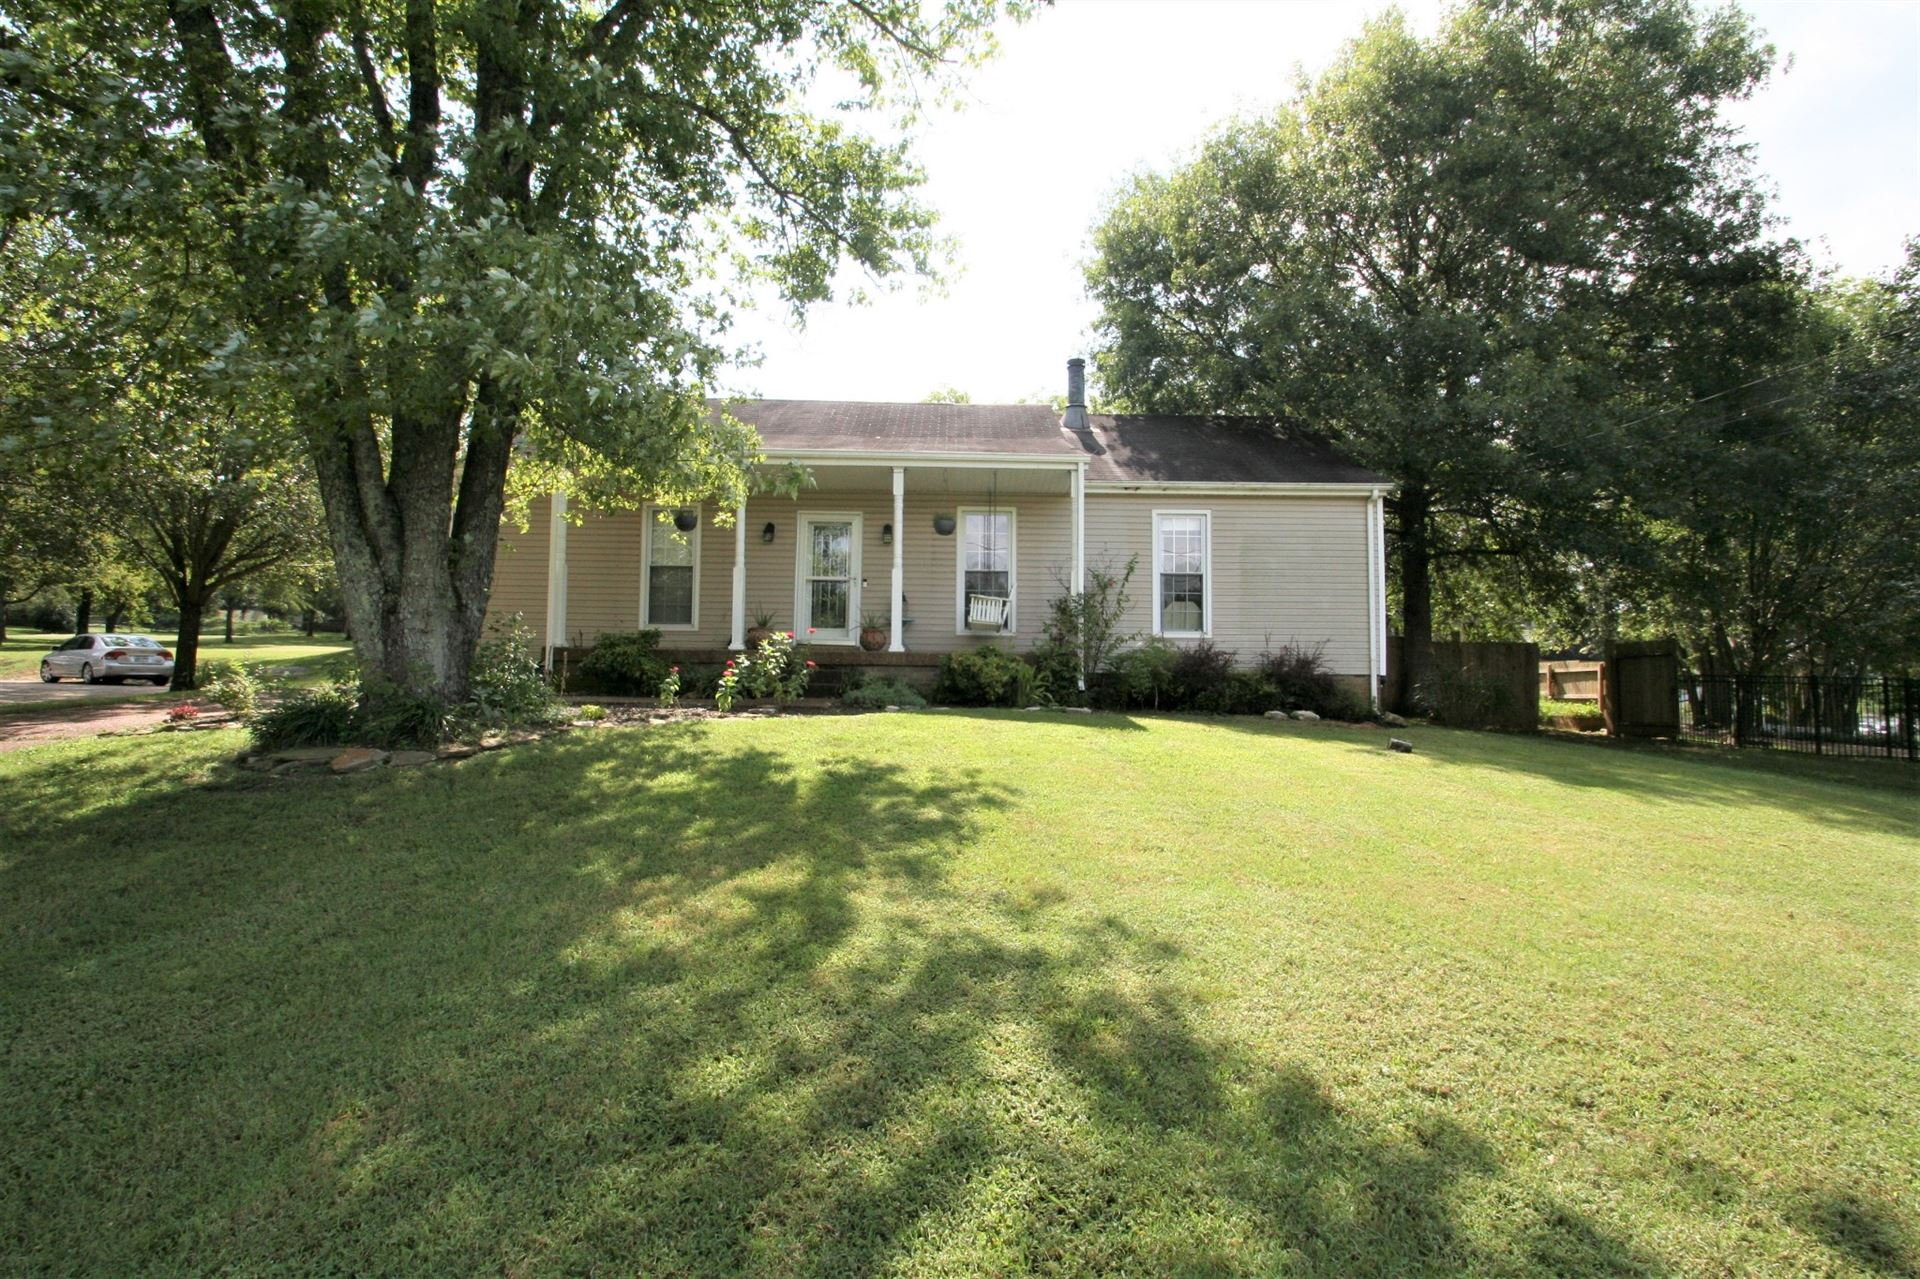 Photo of 1408 Bluegrass Rd, Nolensville, TN 37135 (MLS # 2188793)